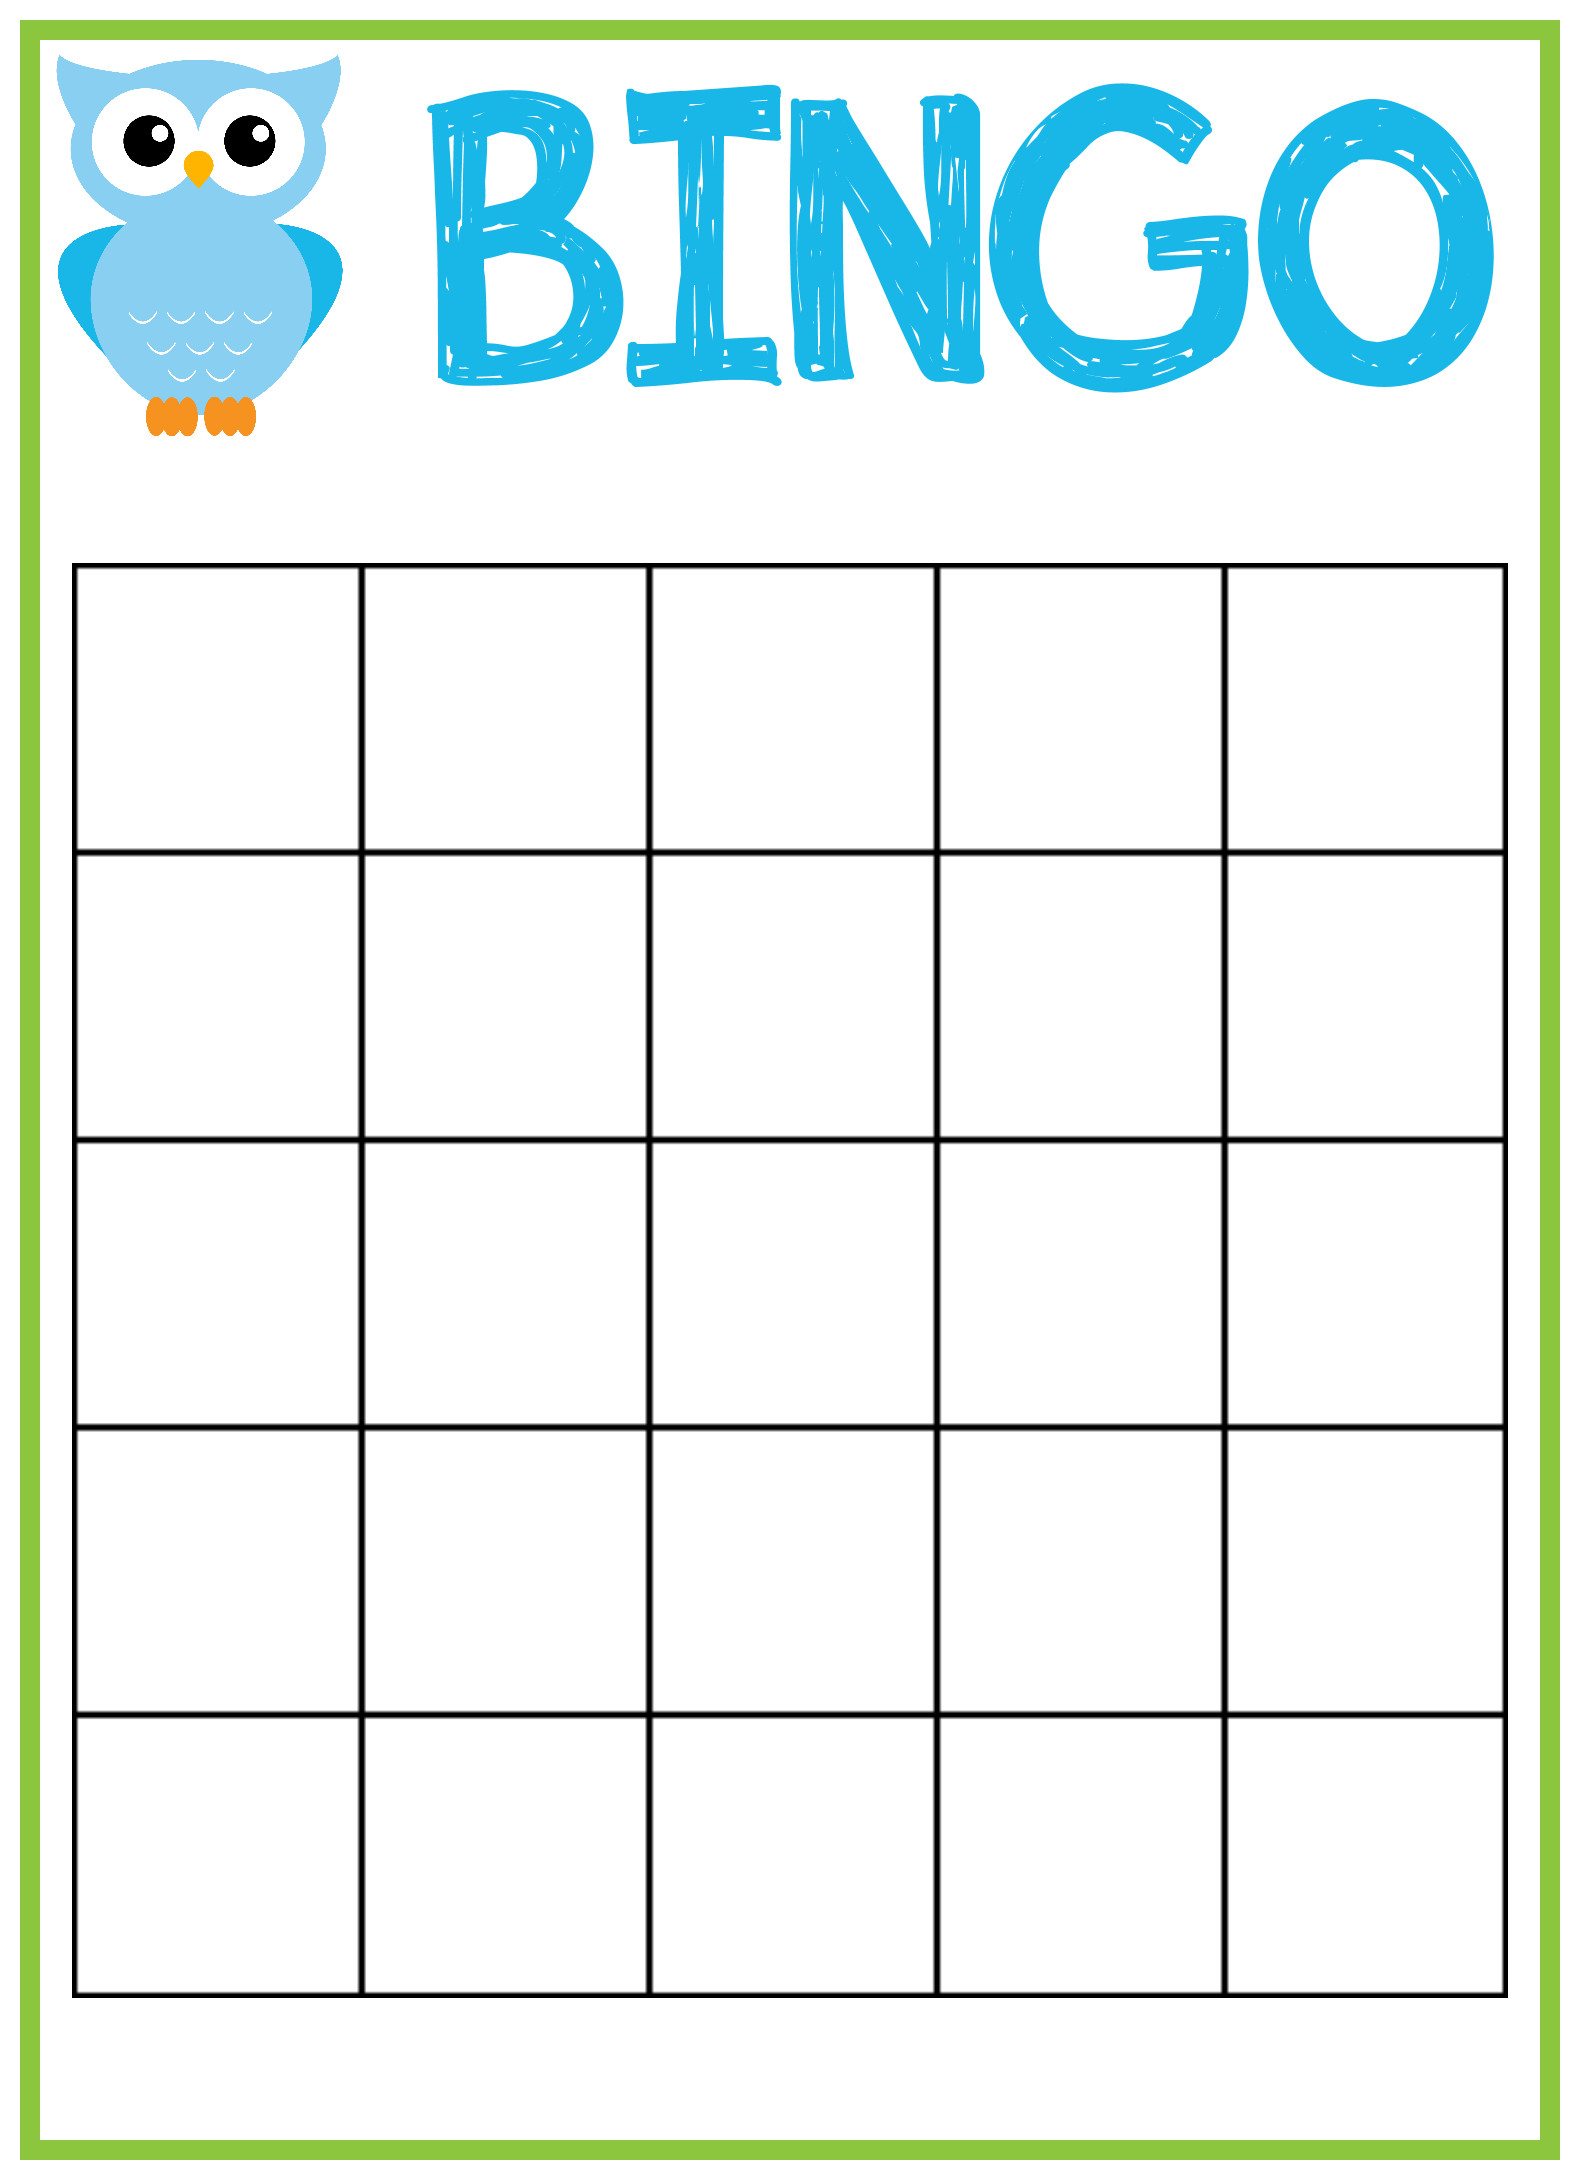 Bingo Card Template Free Baby Bingo Template